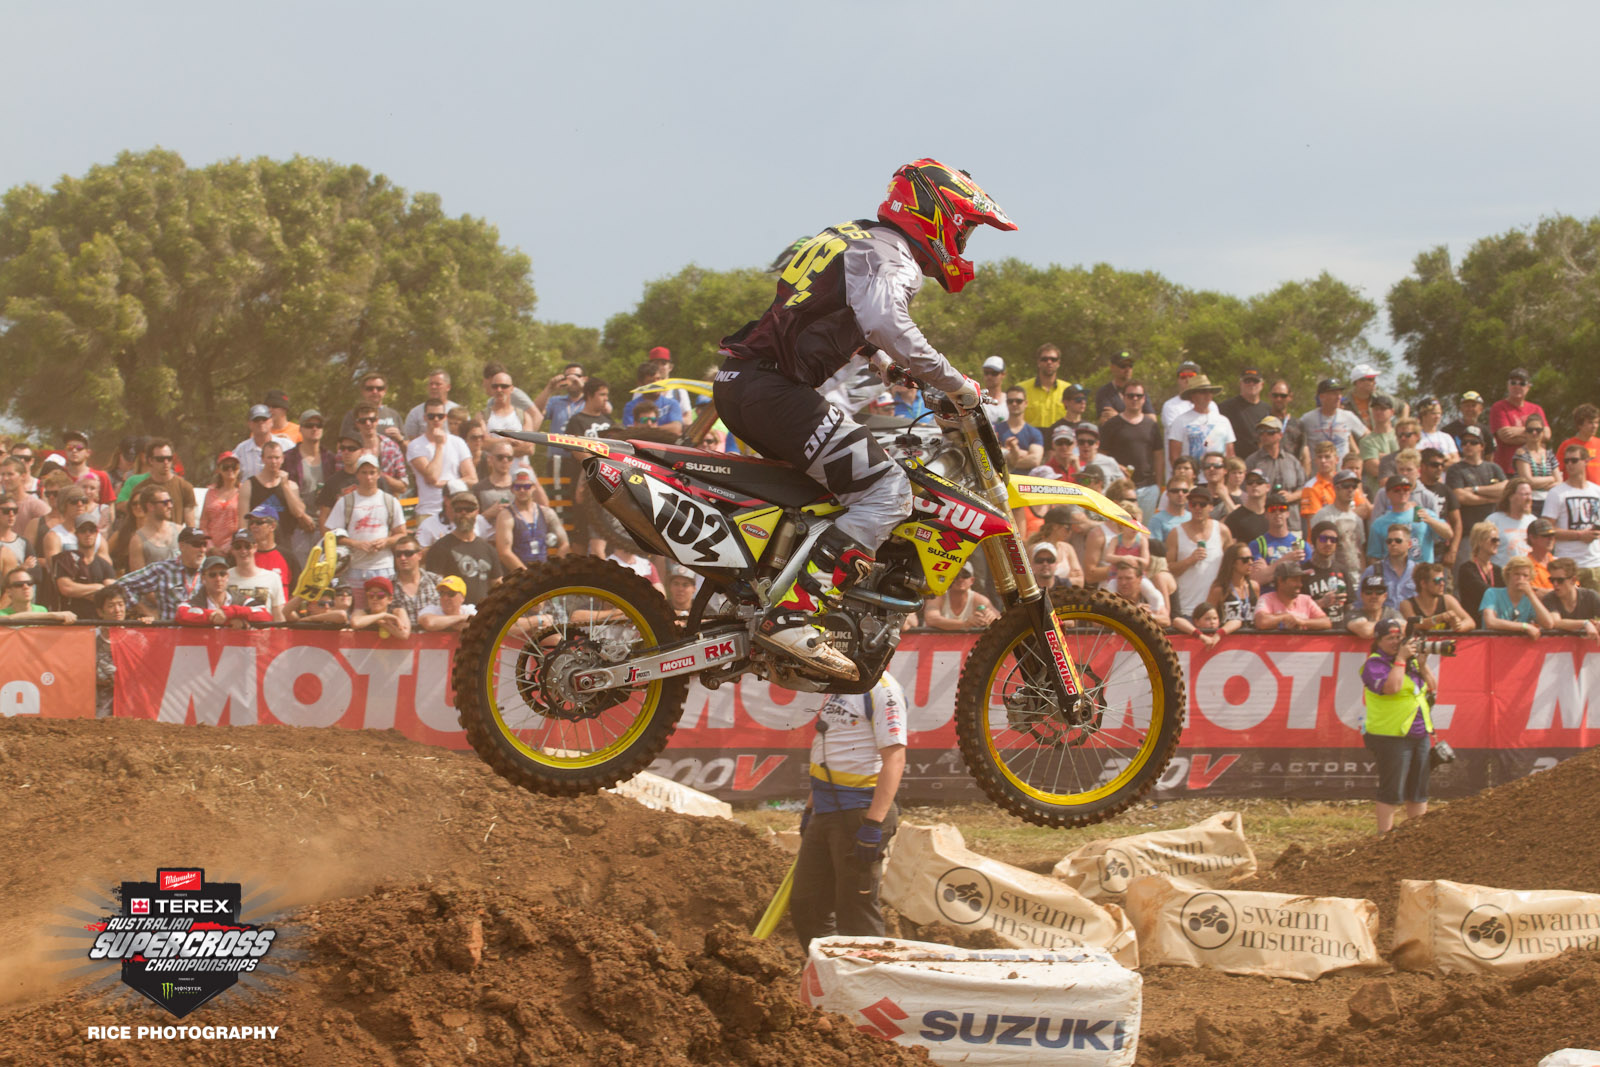 Oct-Nov; Bathurst Oct' 10-11, MotoGP P.I. Oct' 17-19, Brisbane Nov' 8-9